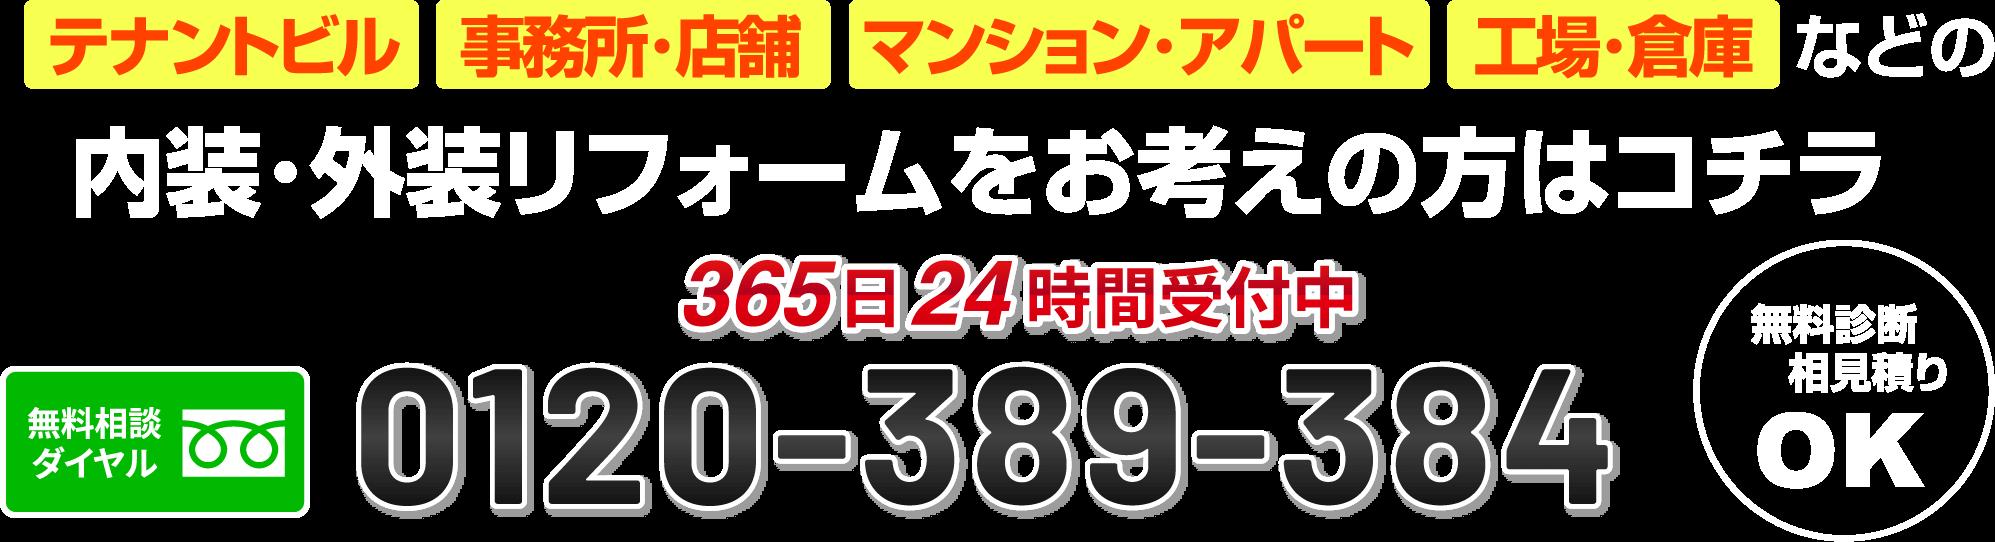 0120389384